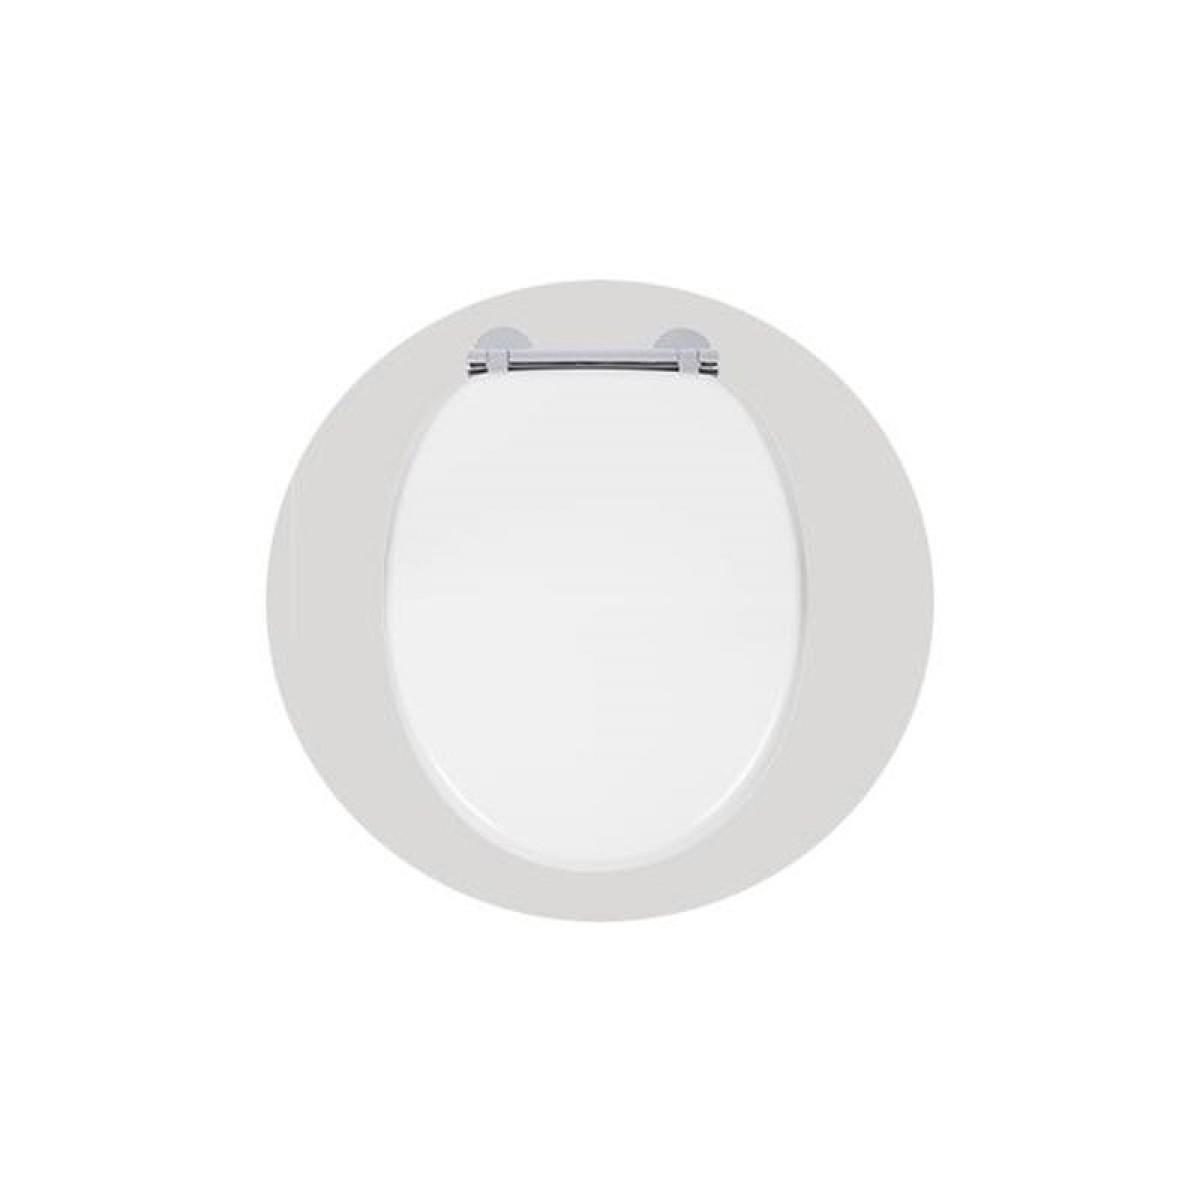 Croydex Flexi Fix Lucerne Toilet Seat Lowest Prices